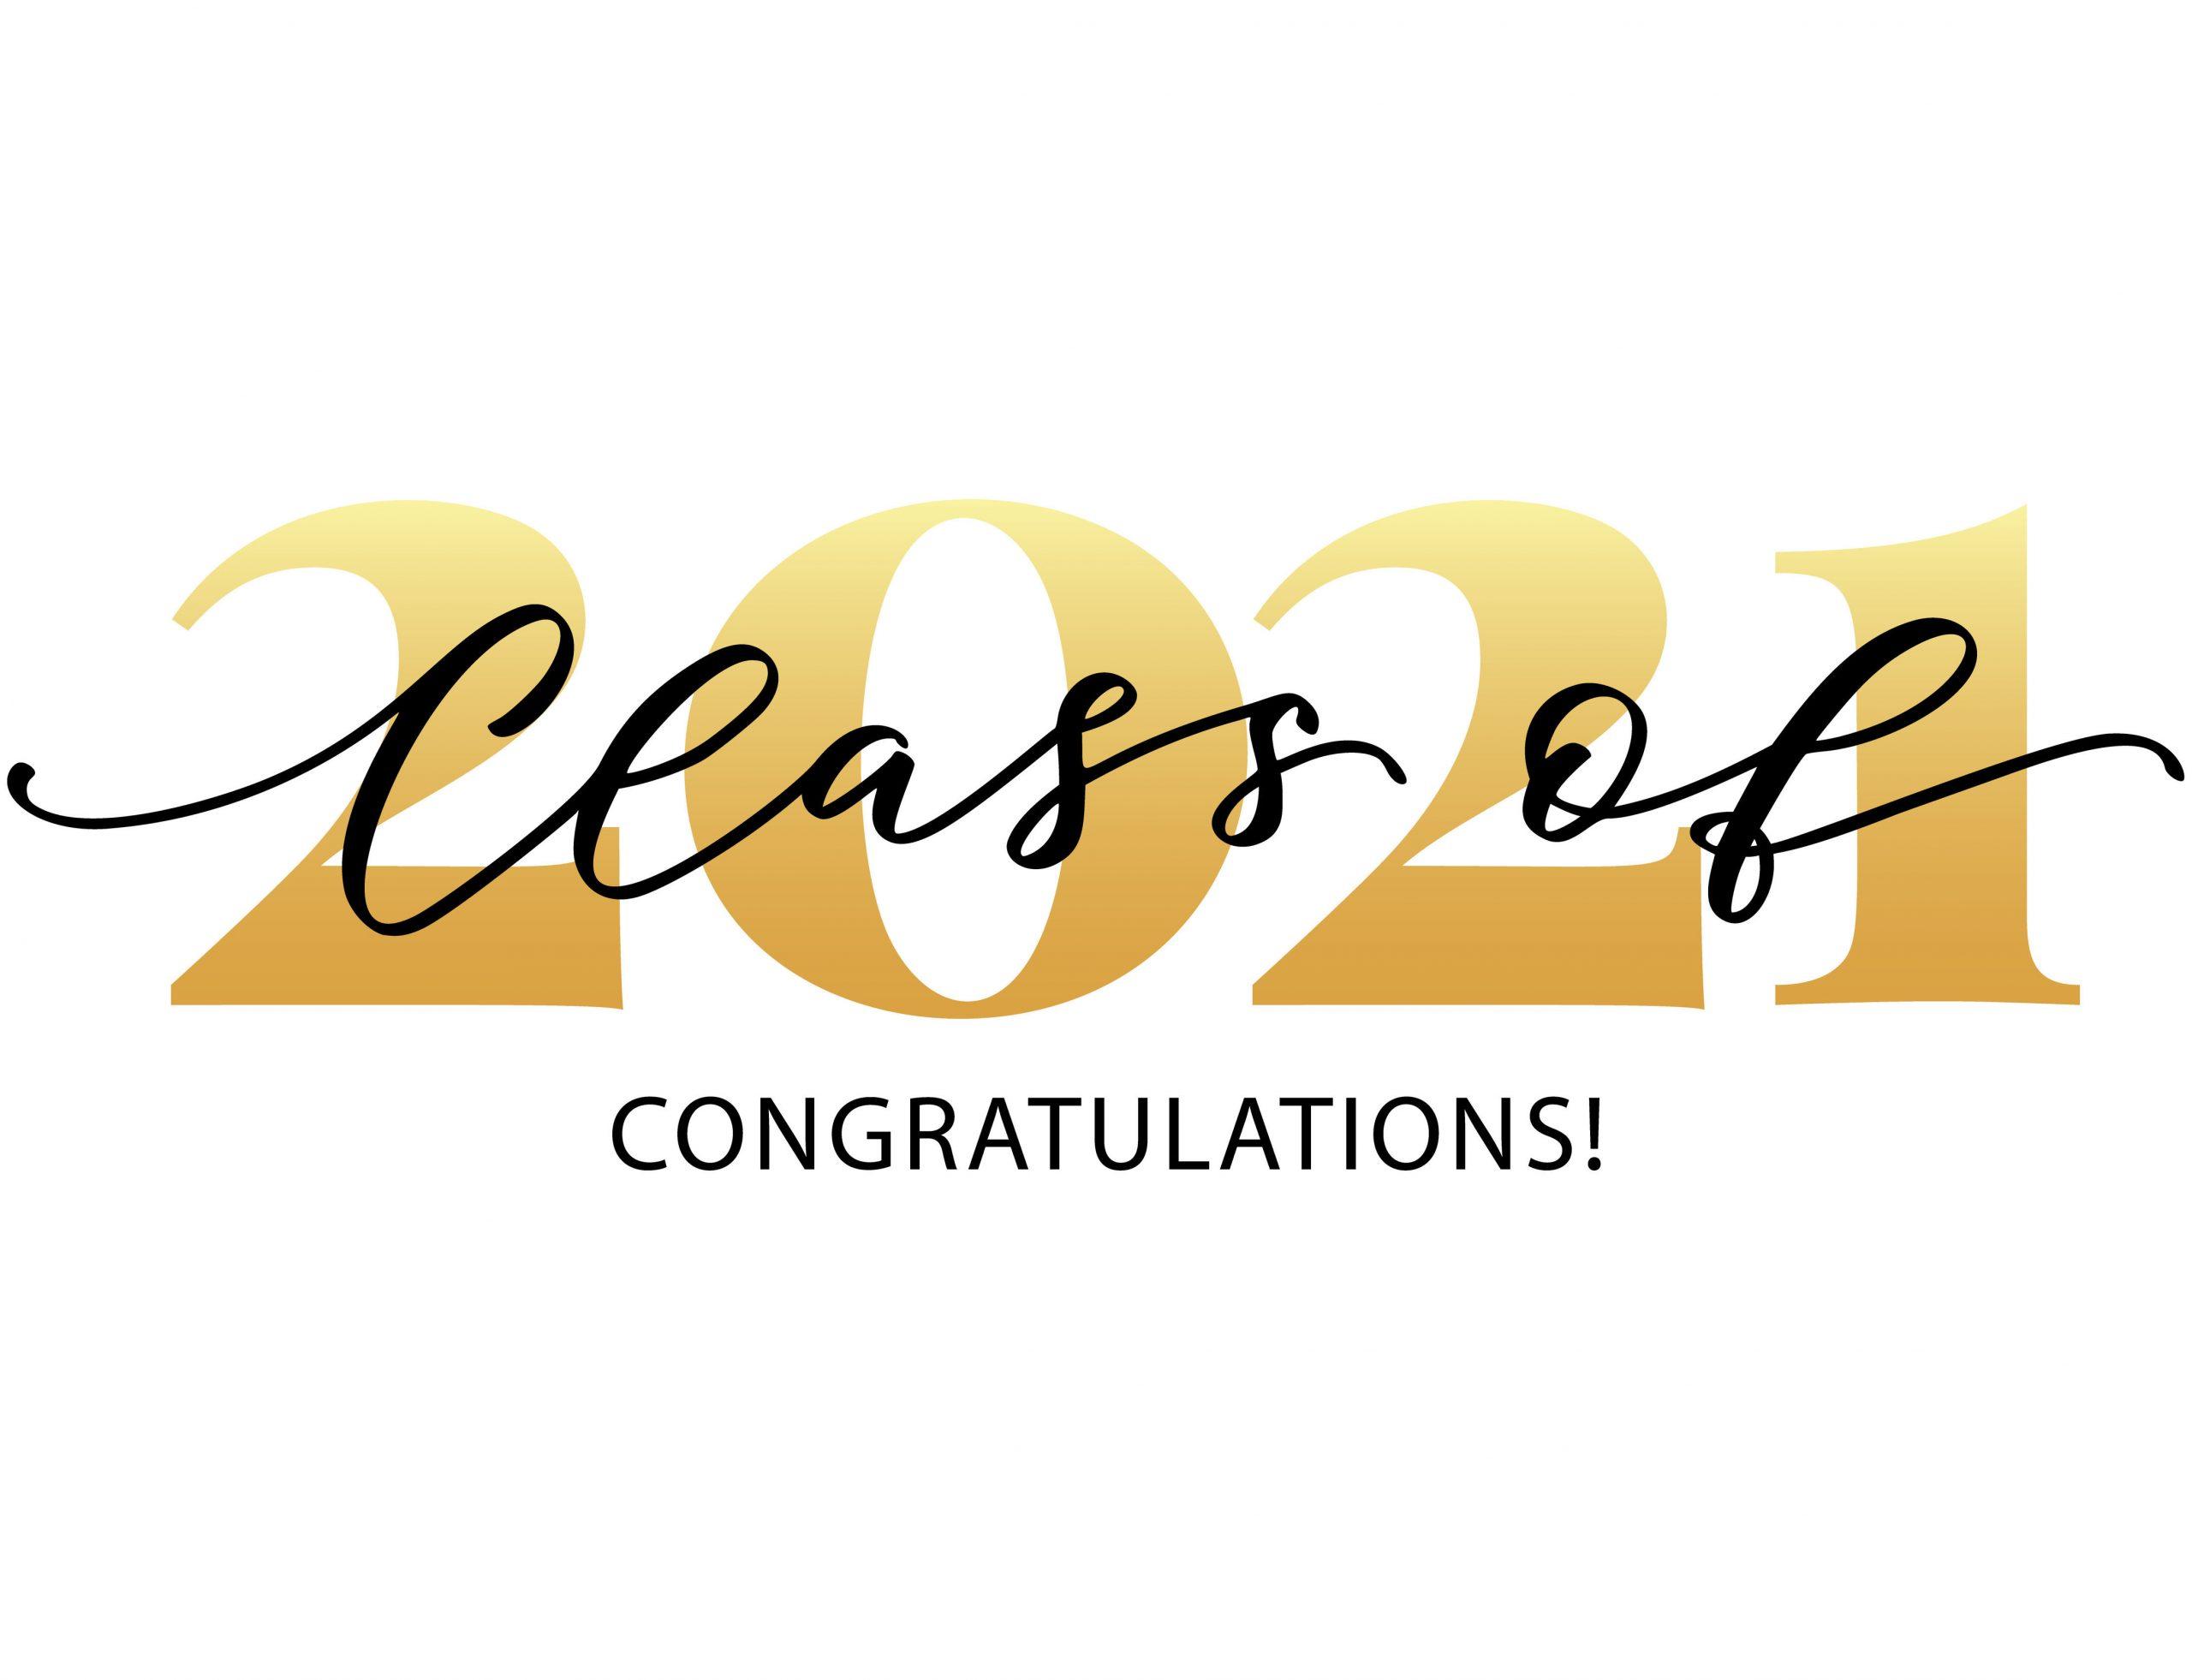 Button for certificate graduates 2021